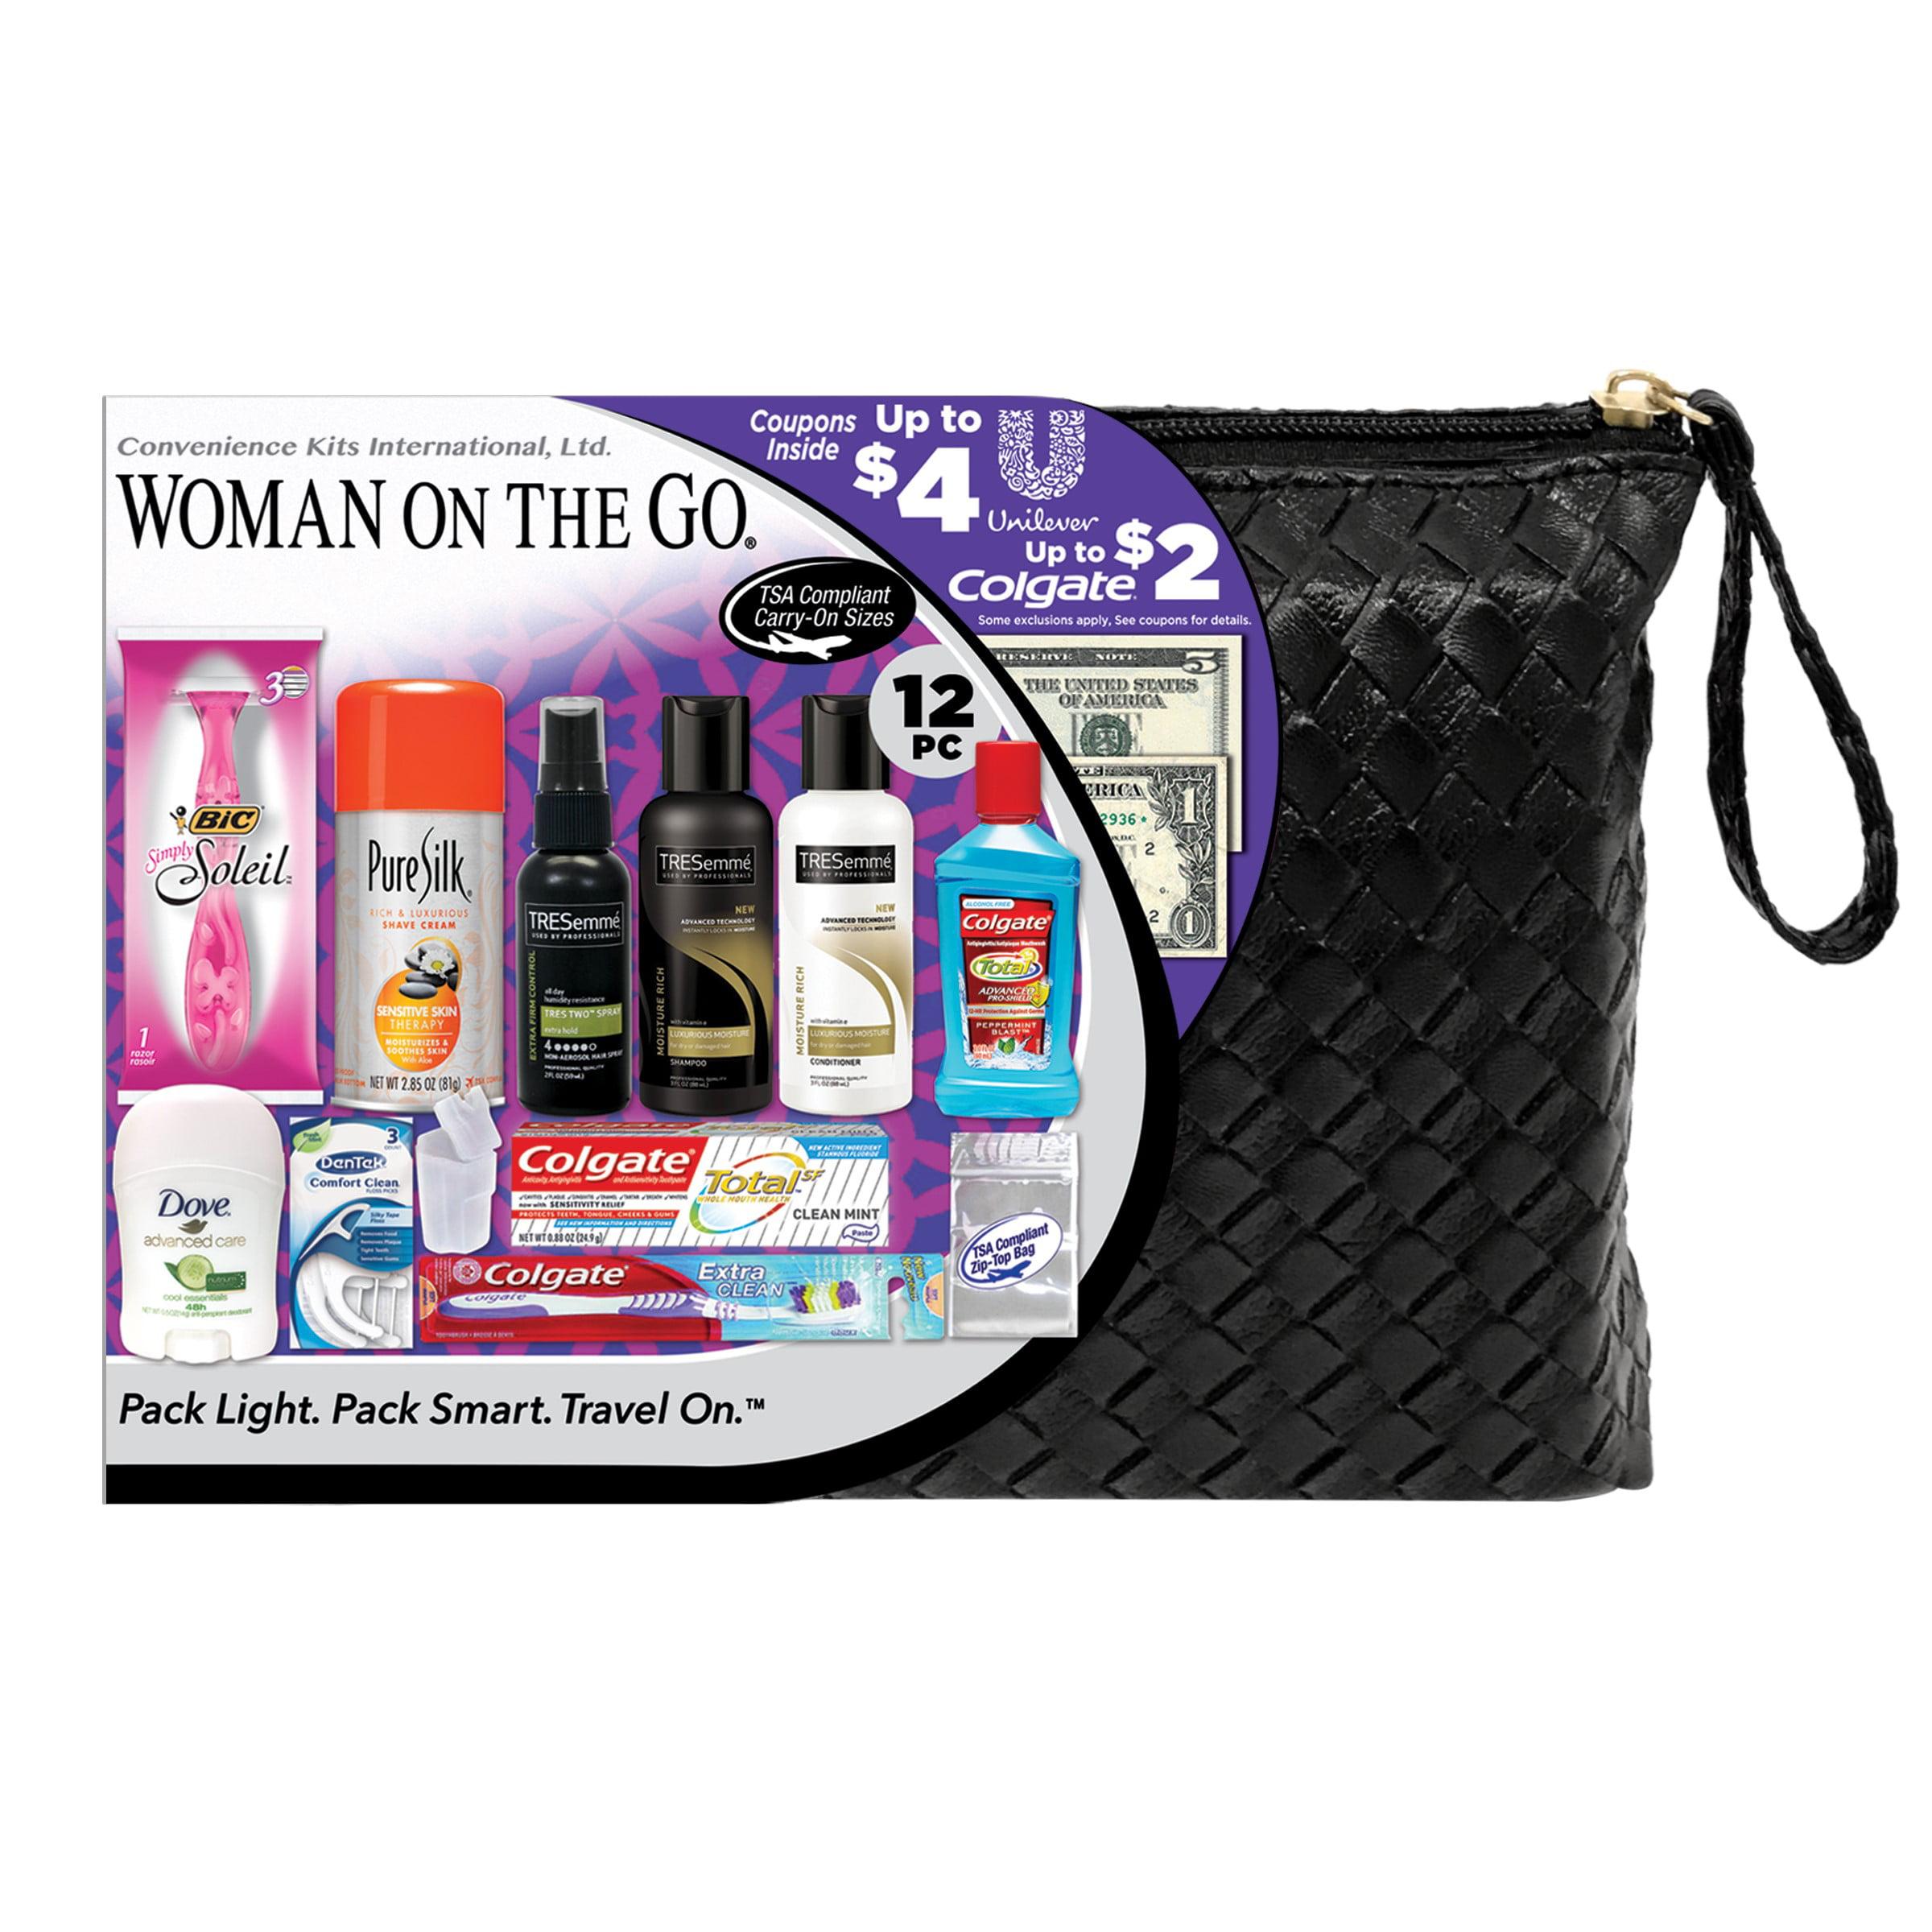 836ec789f681 Convenience Kits International, Women's TRESemme Premium 12 PC Assembled  Travel Kit, TSA Compliant, in Reusable Toiletry Zippered Bag w/ Handle, ...